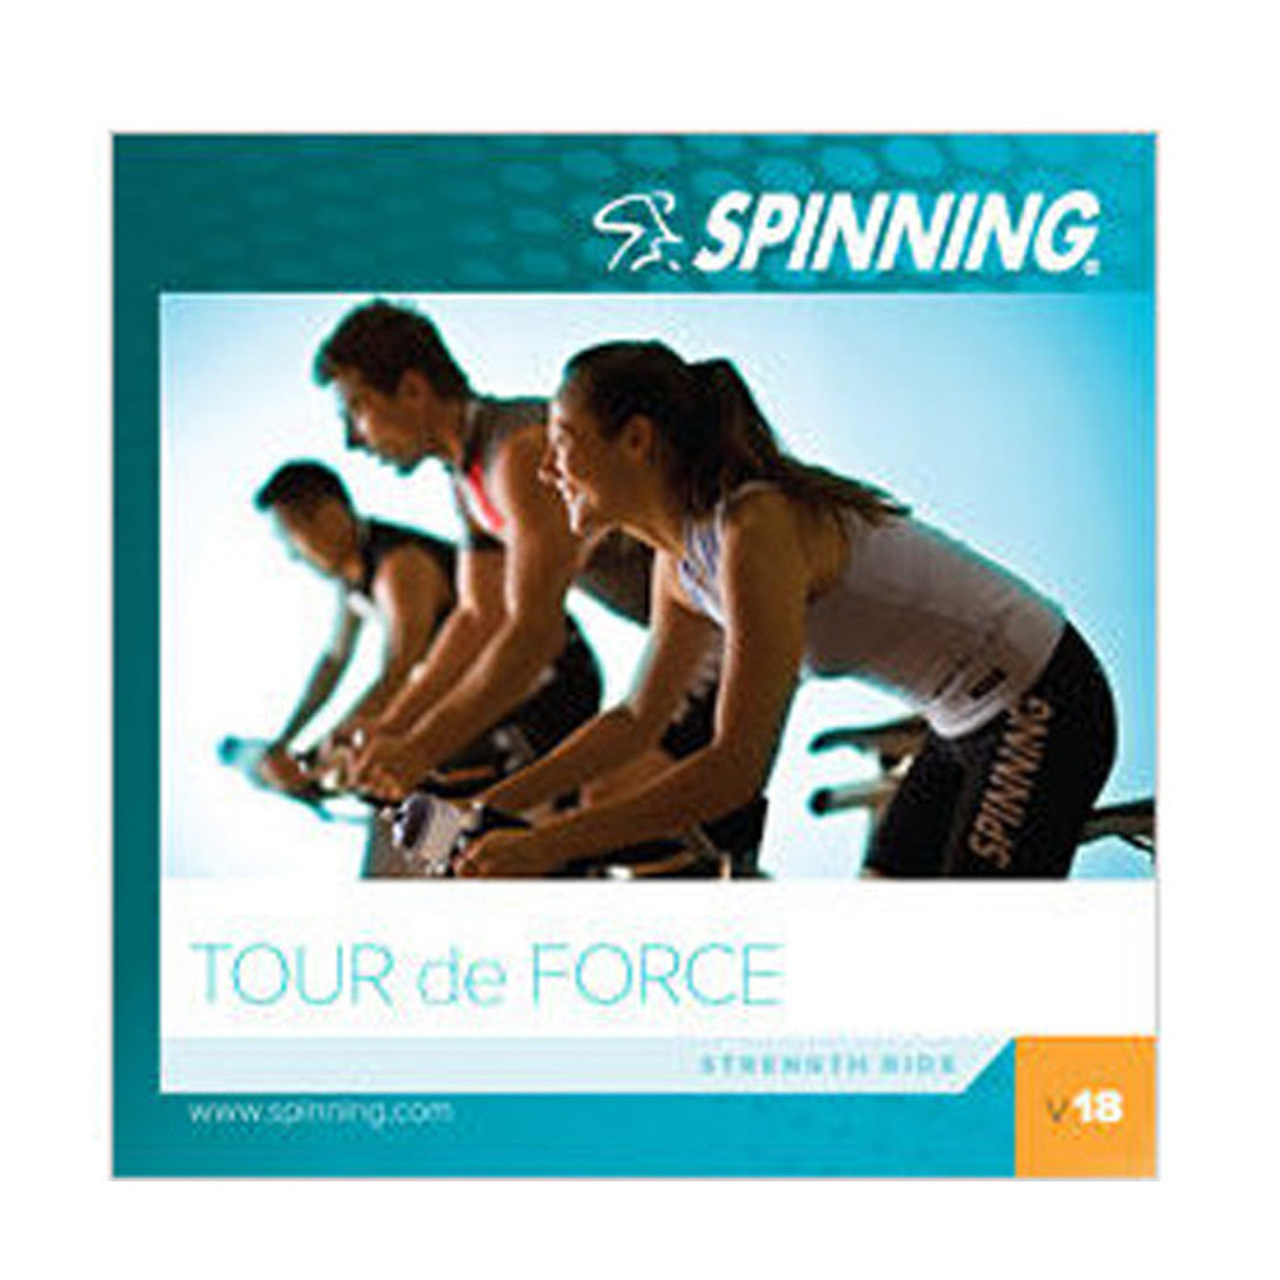 Spinning® CD Volume 18 | Tour de Force